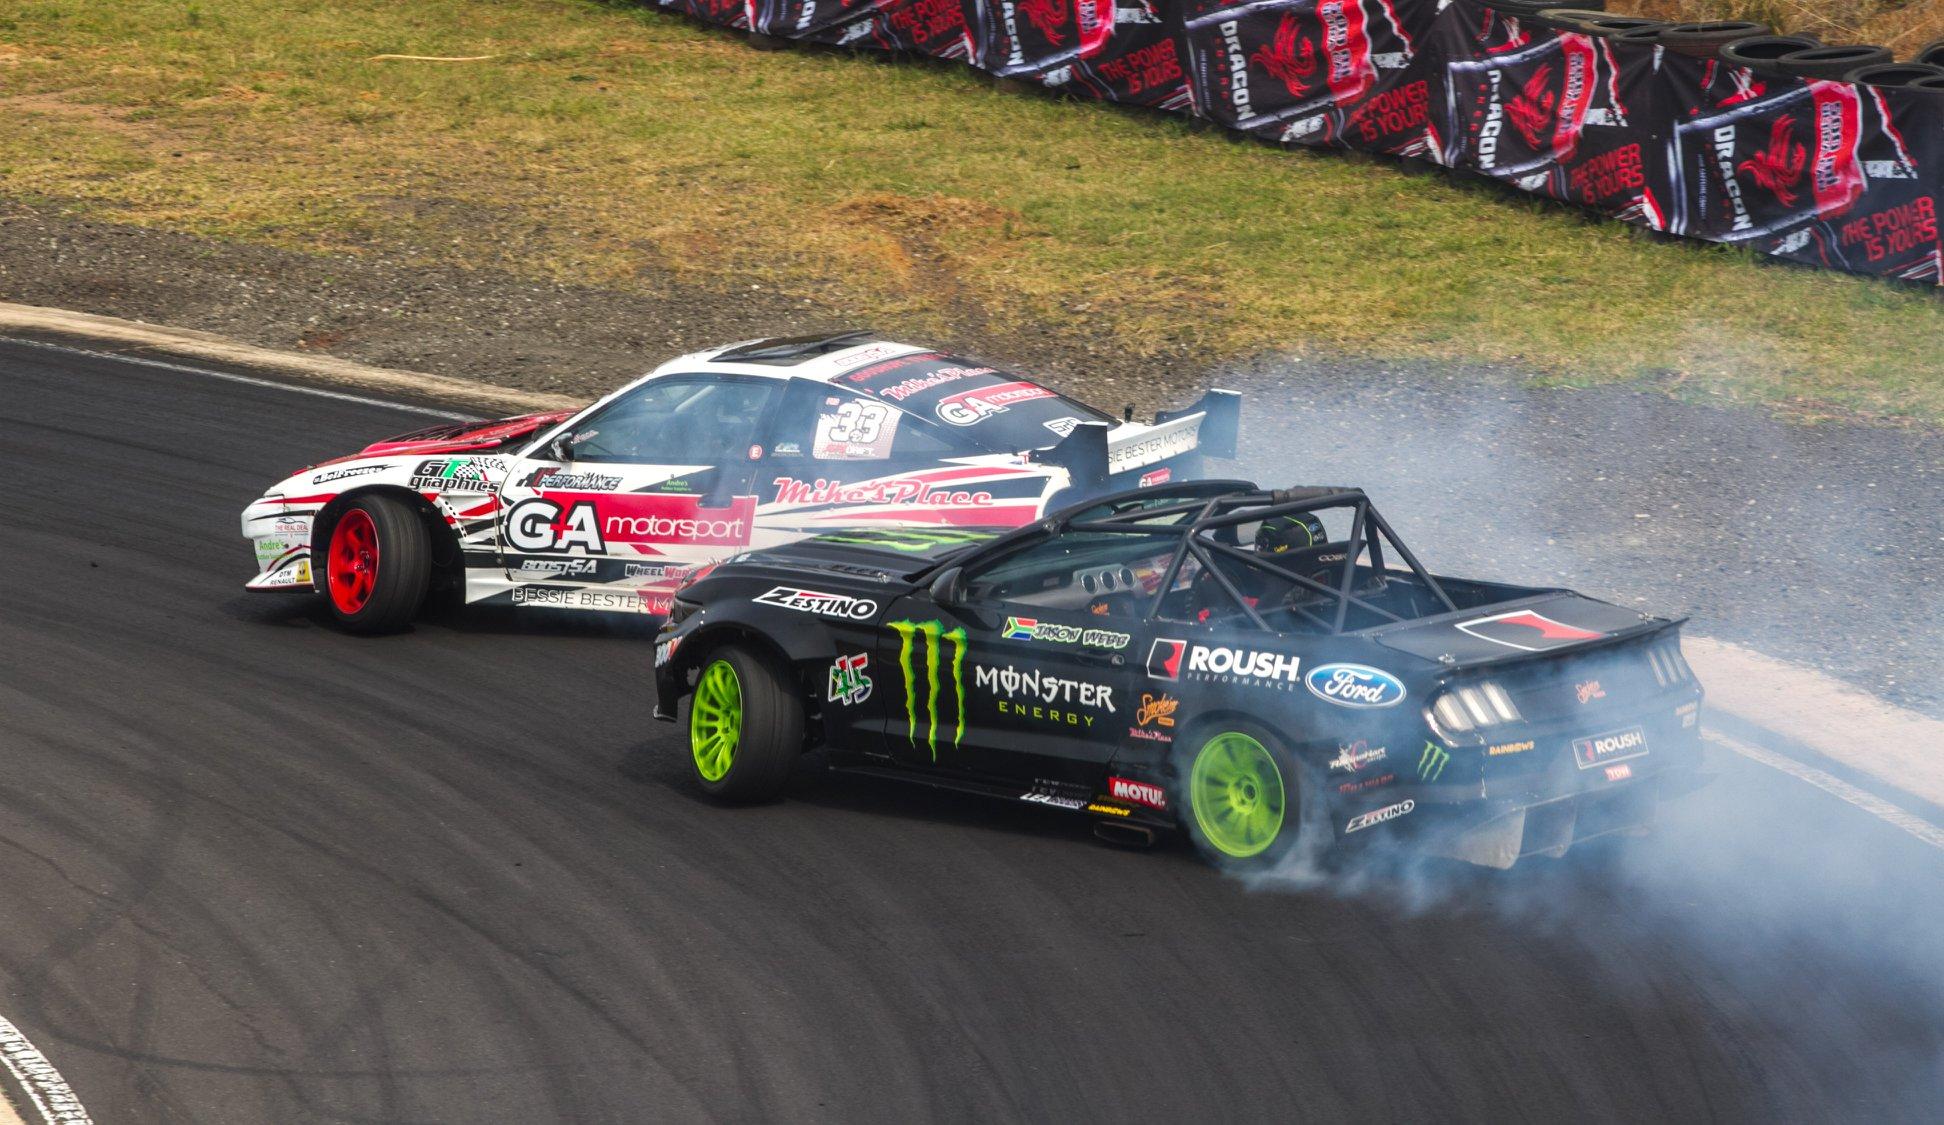 Drifting action at SupaDrift Series from Dezzi Raceway